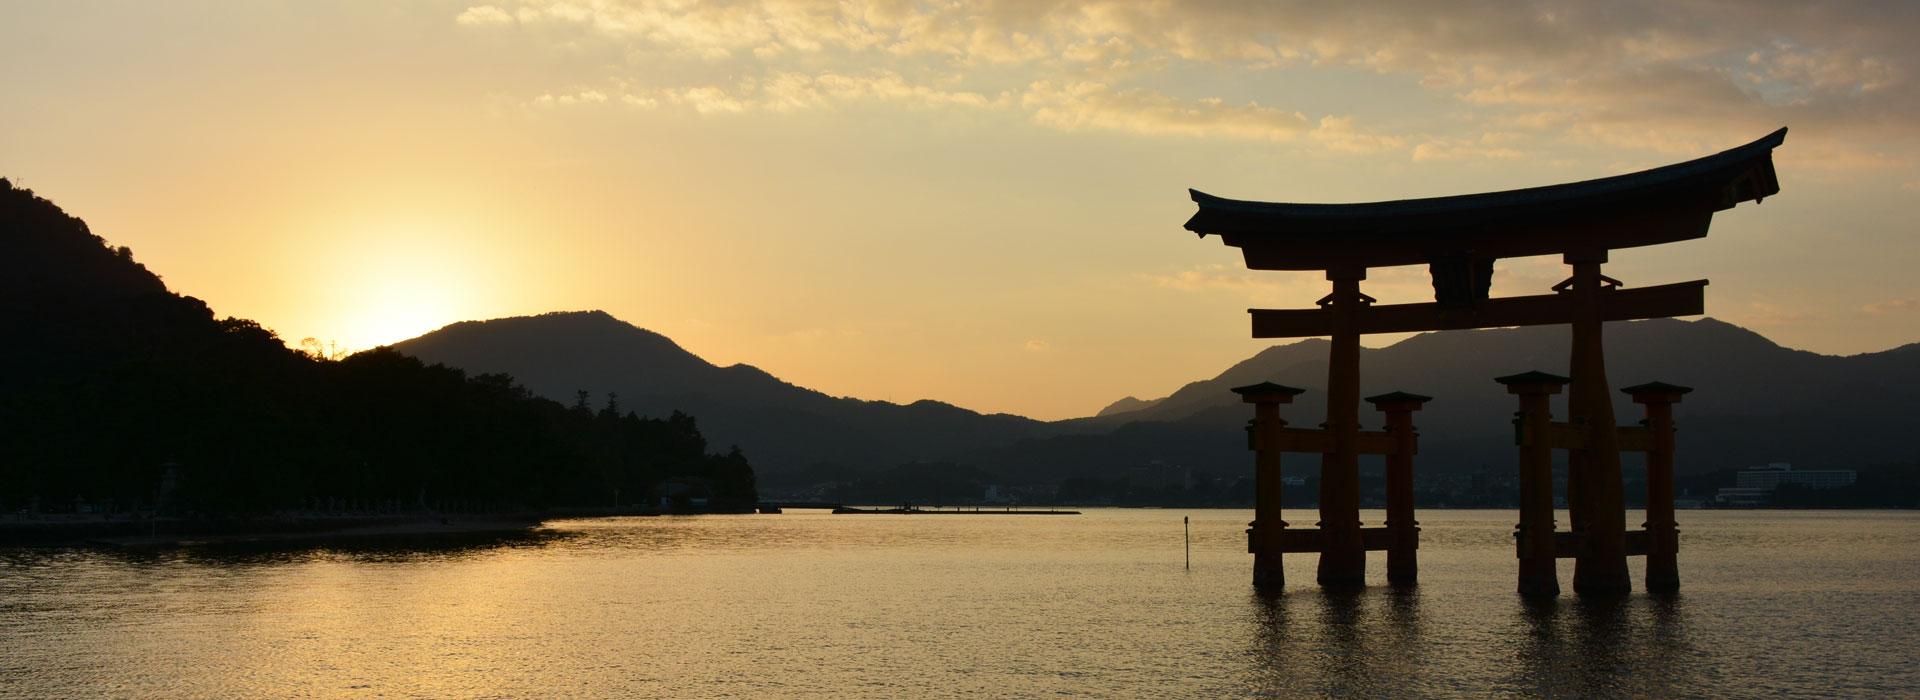 9D8N Tokyo, Mt. Fuji / Hakone, Hiroshima, Kyoto & Osaka